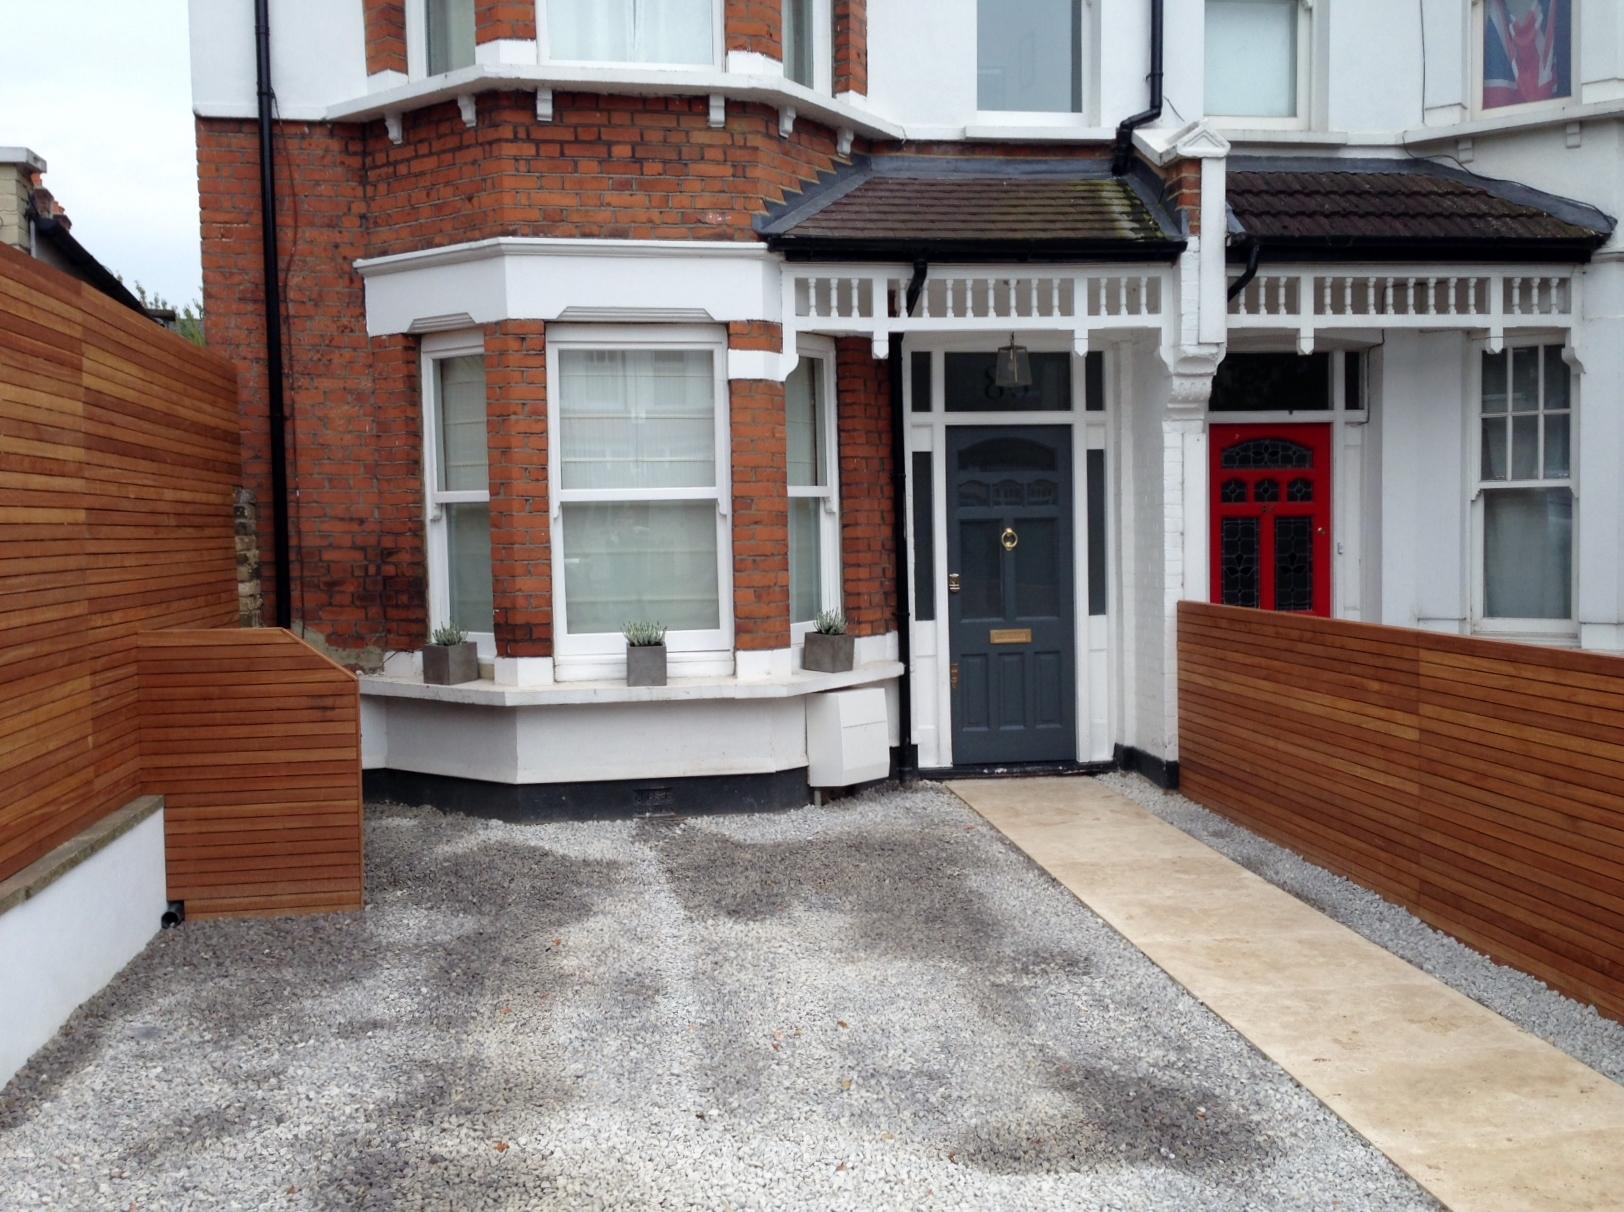 front garden drivewat gravel travertine paving path hardwood privacy screen trellis tooting london (4)